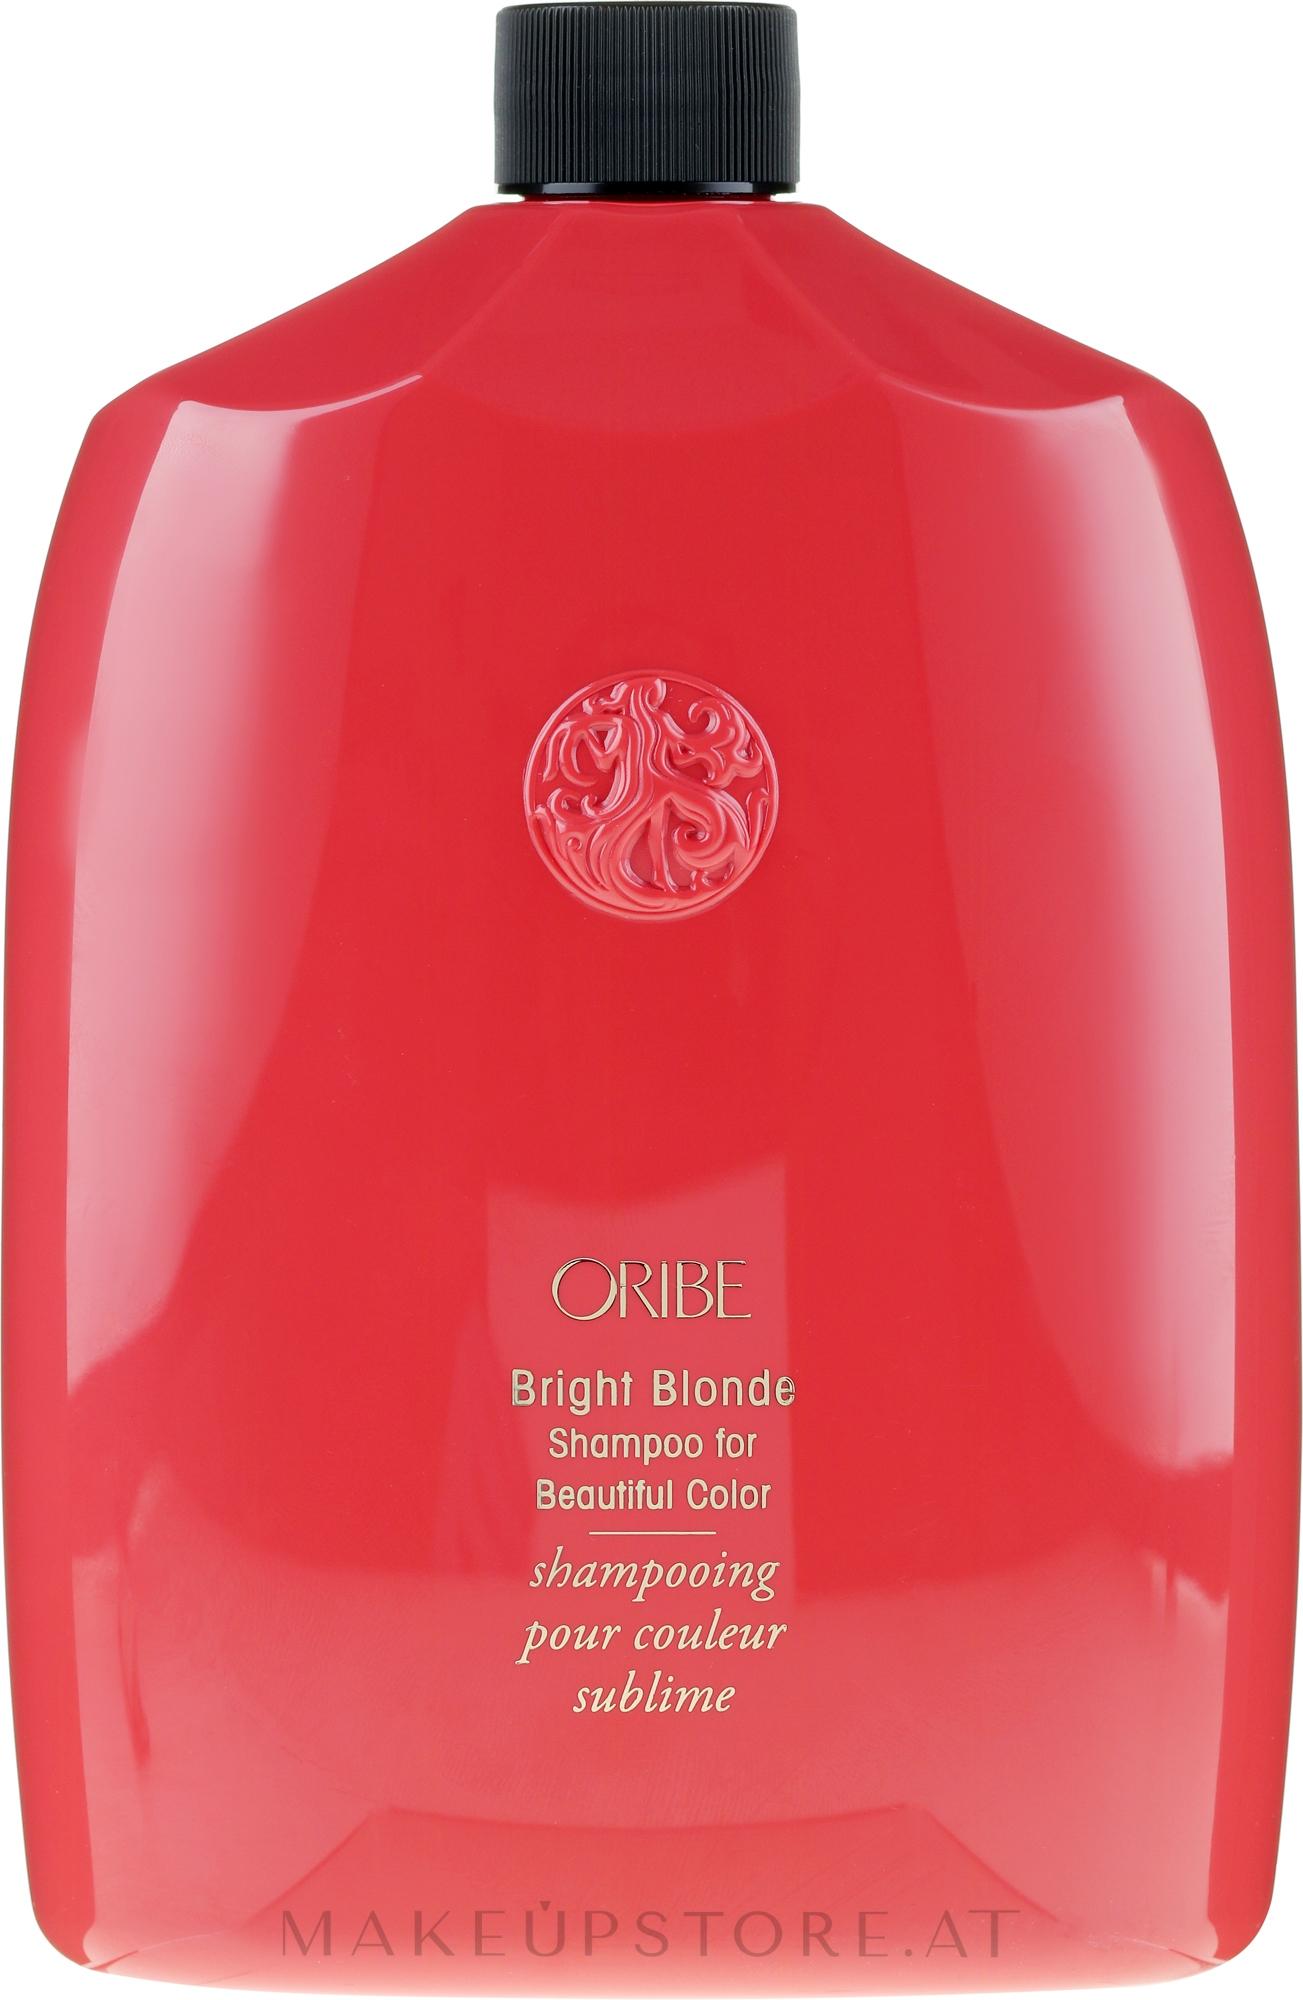 Shampoo für blondes Haar - Oribe Bright Blonde For Beautiful Color Shampoo — Bild 1000 ml